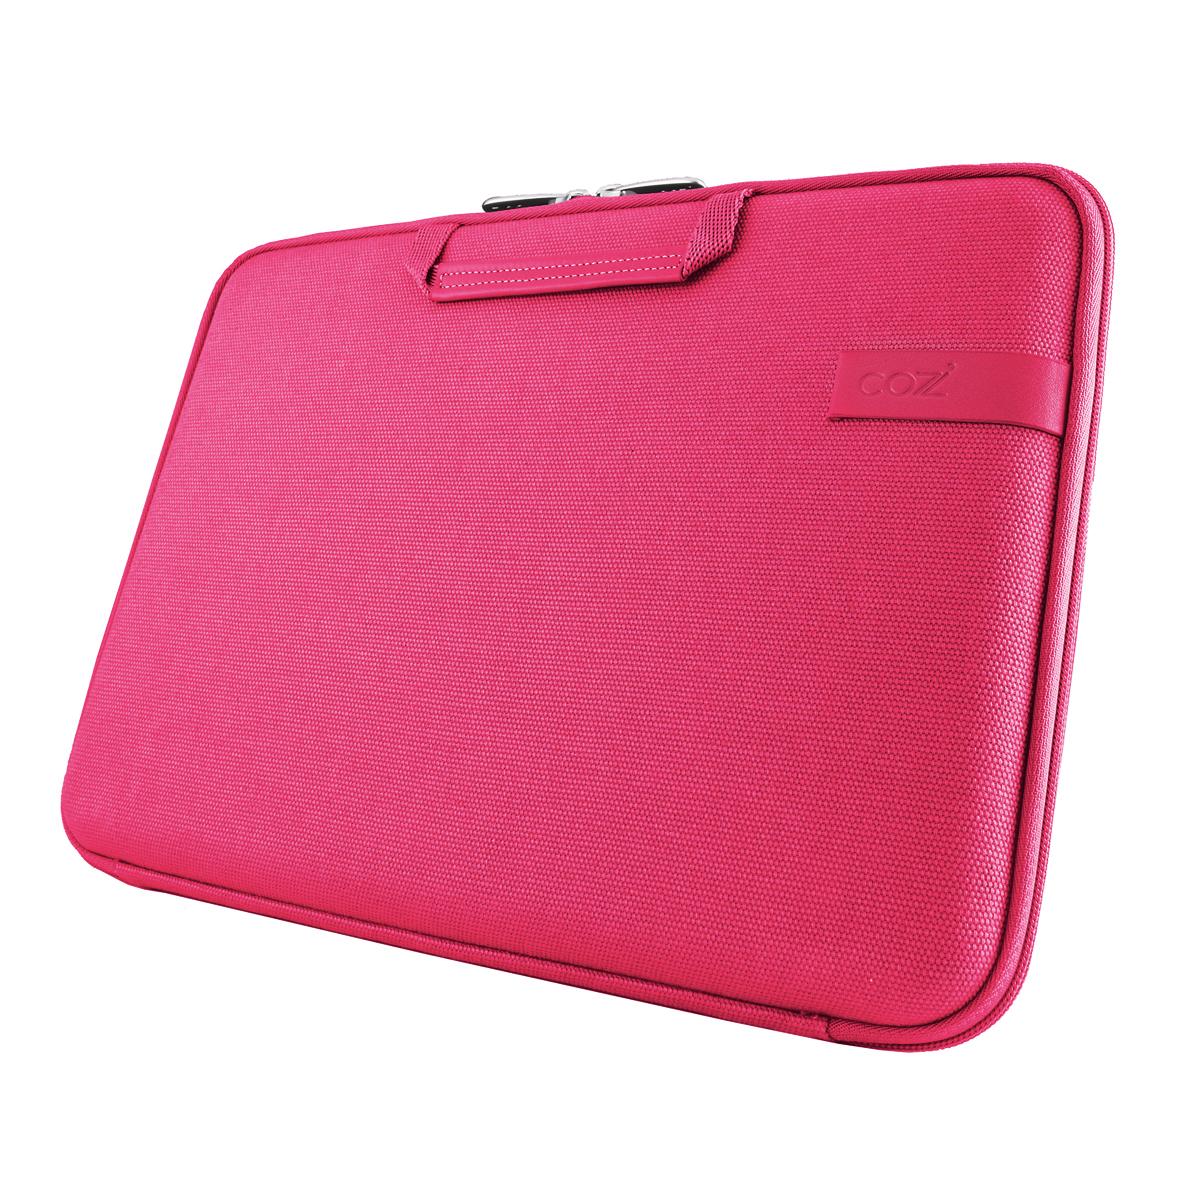 Cozistyle 13吋 Macbook Air /Macbook Pro(Retina) 智能散熱防潑水手提硬殼電腦保護套-帆布蜜桃紅